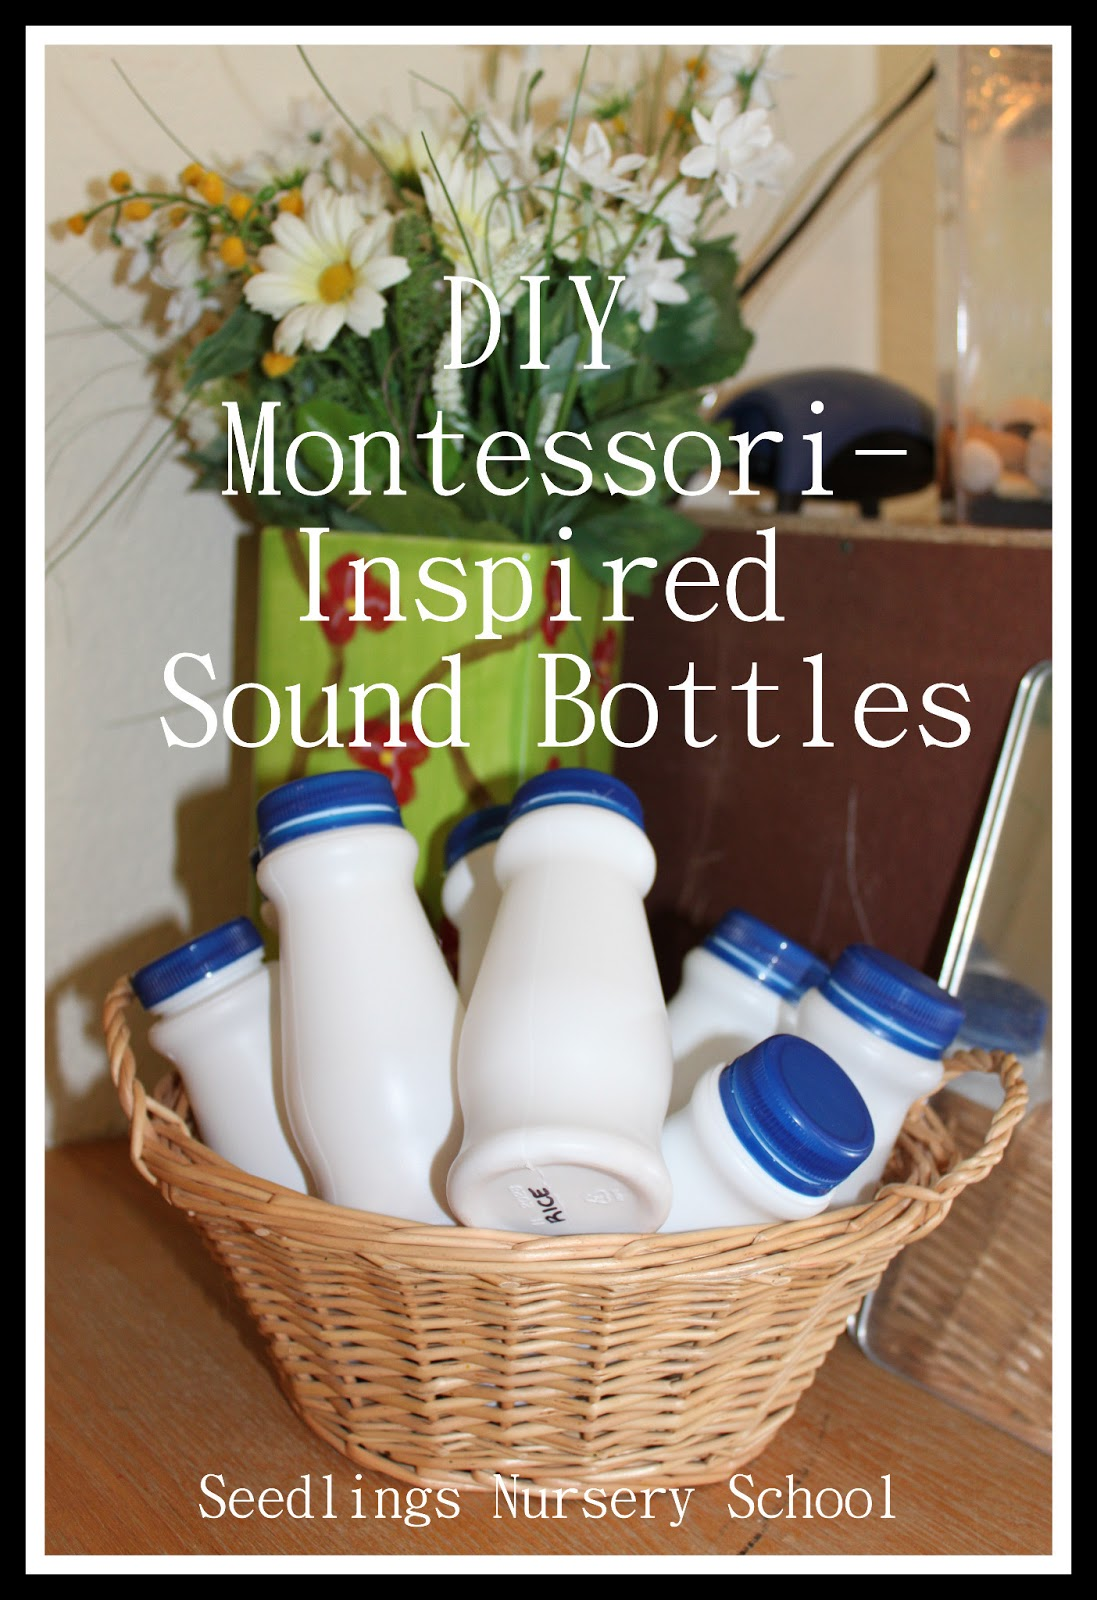 Seedlings Nursery School Diy Montessori Inspired Sound